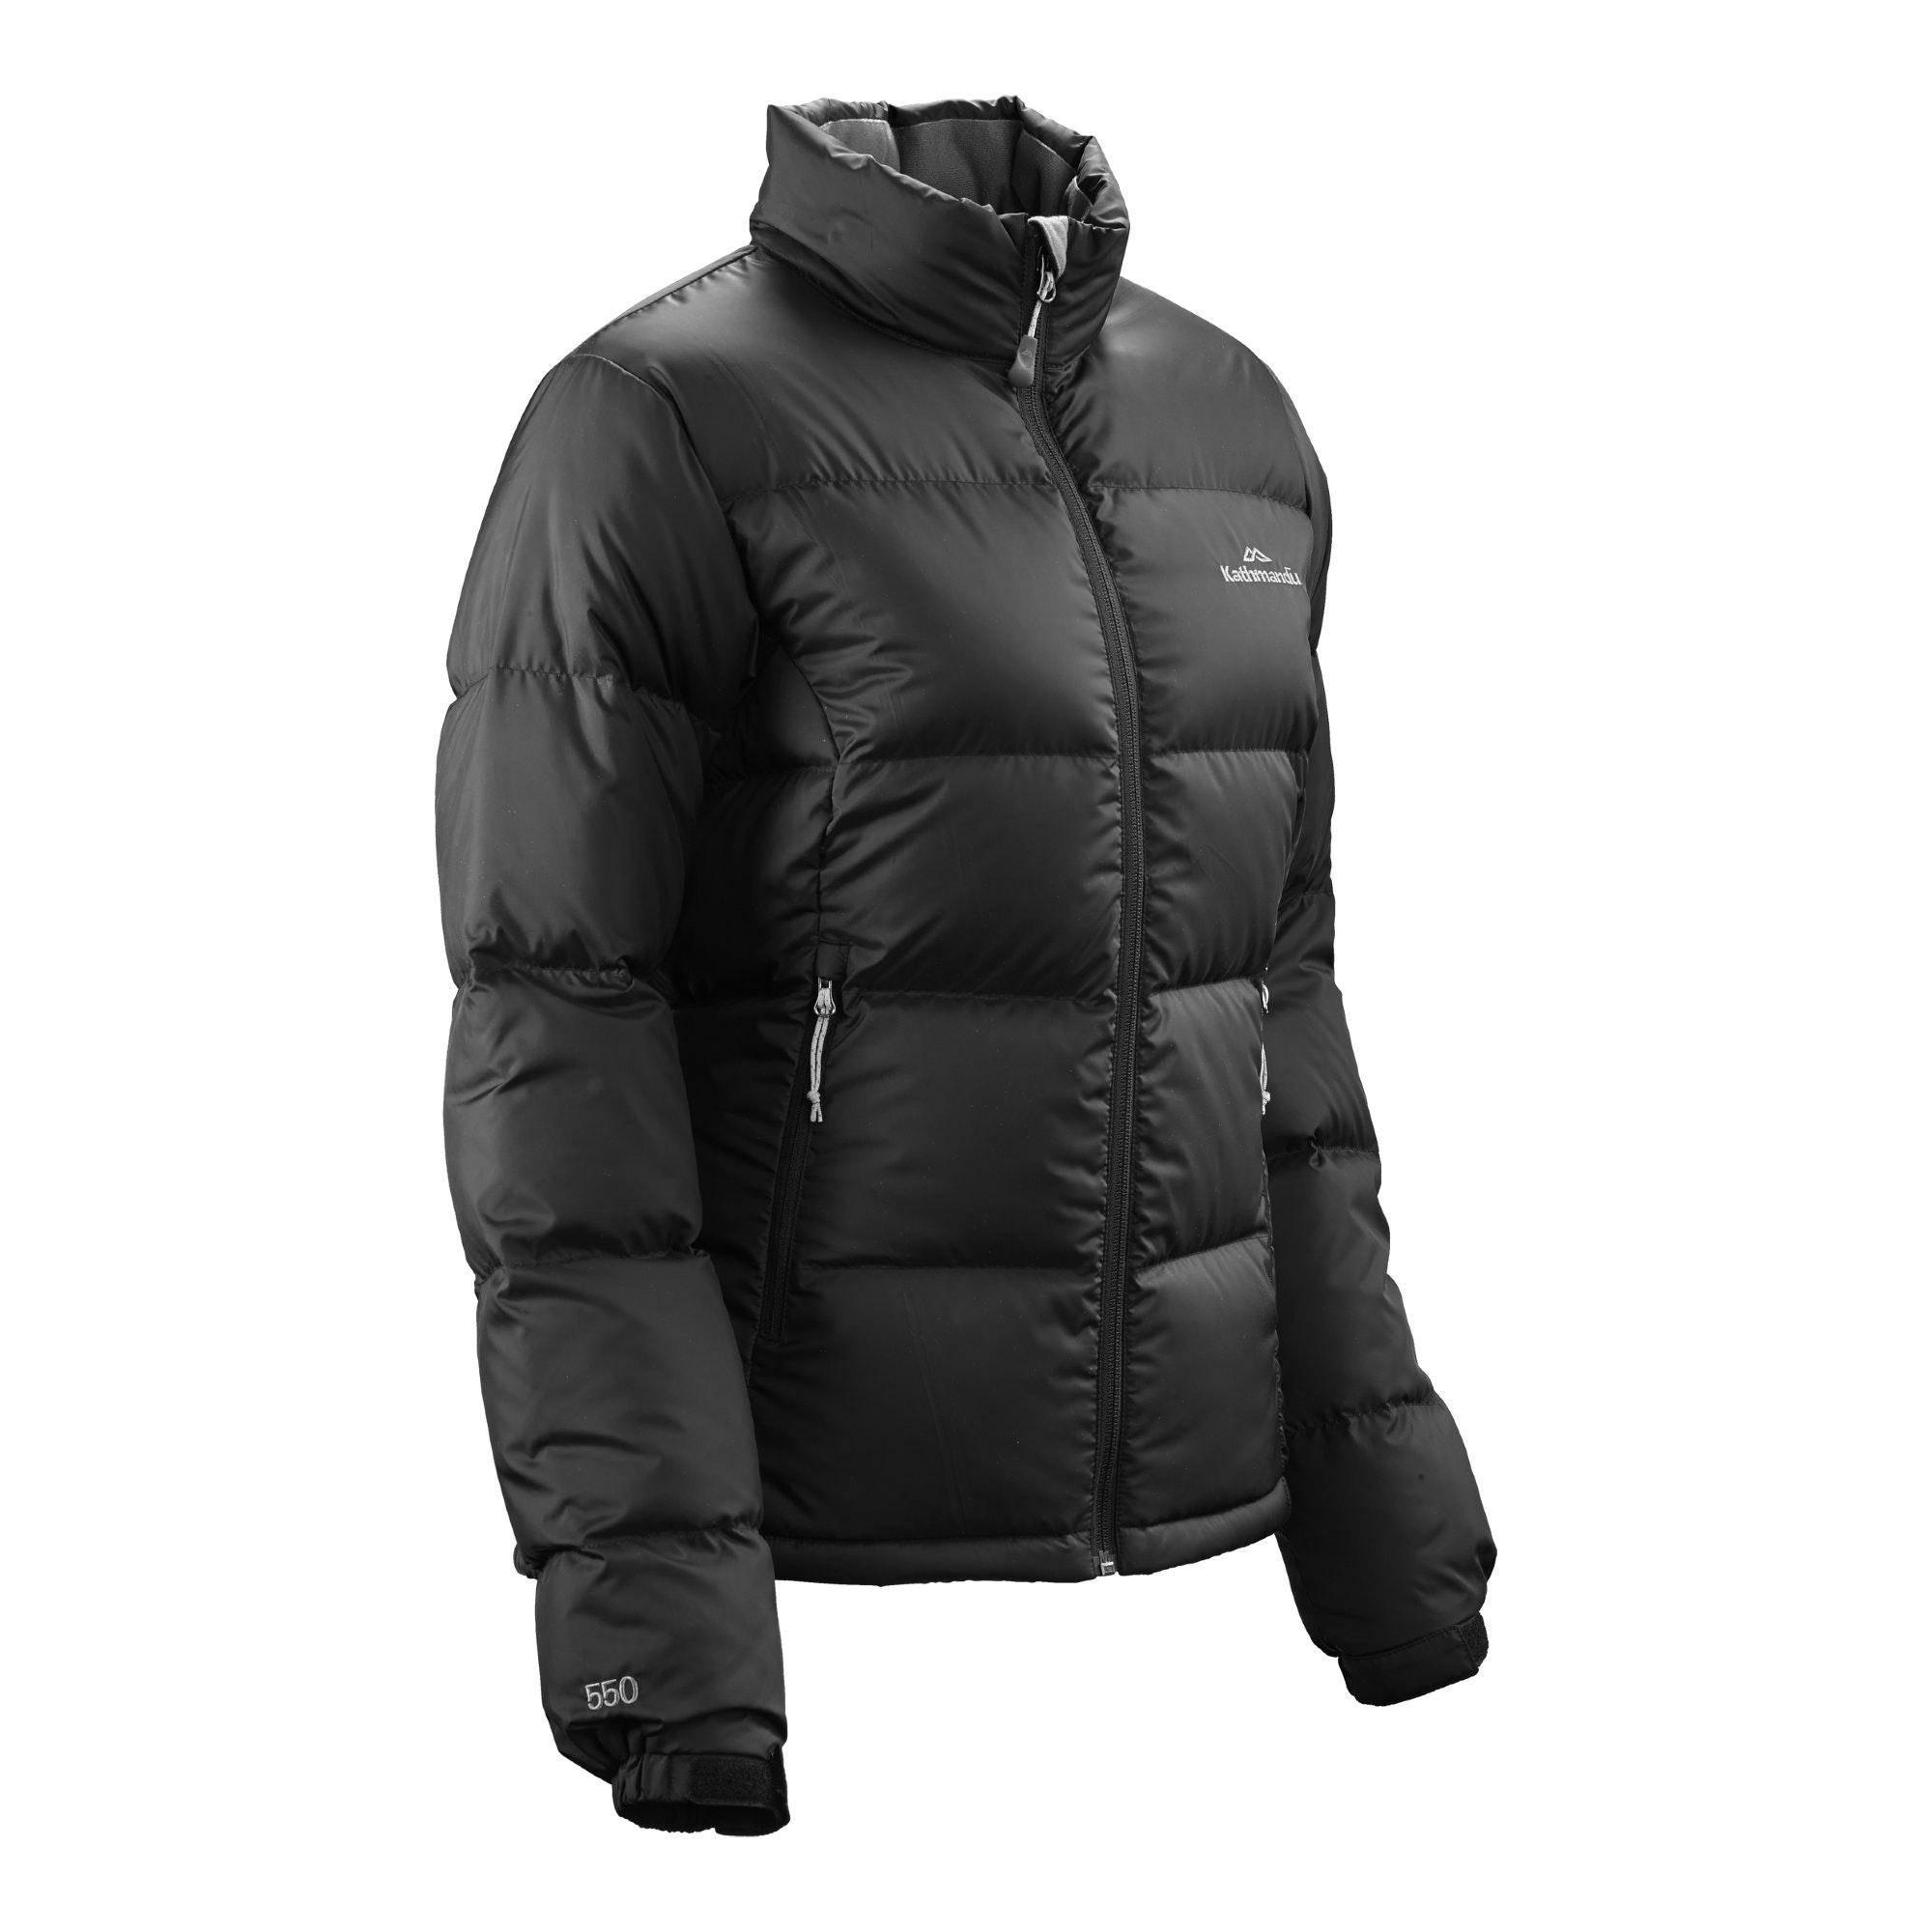 Epiq Women's Duck Down Jacket - Black